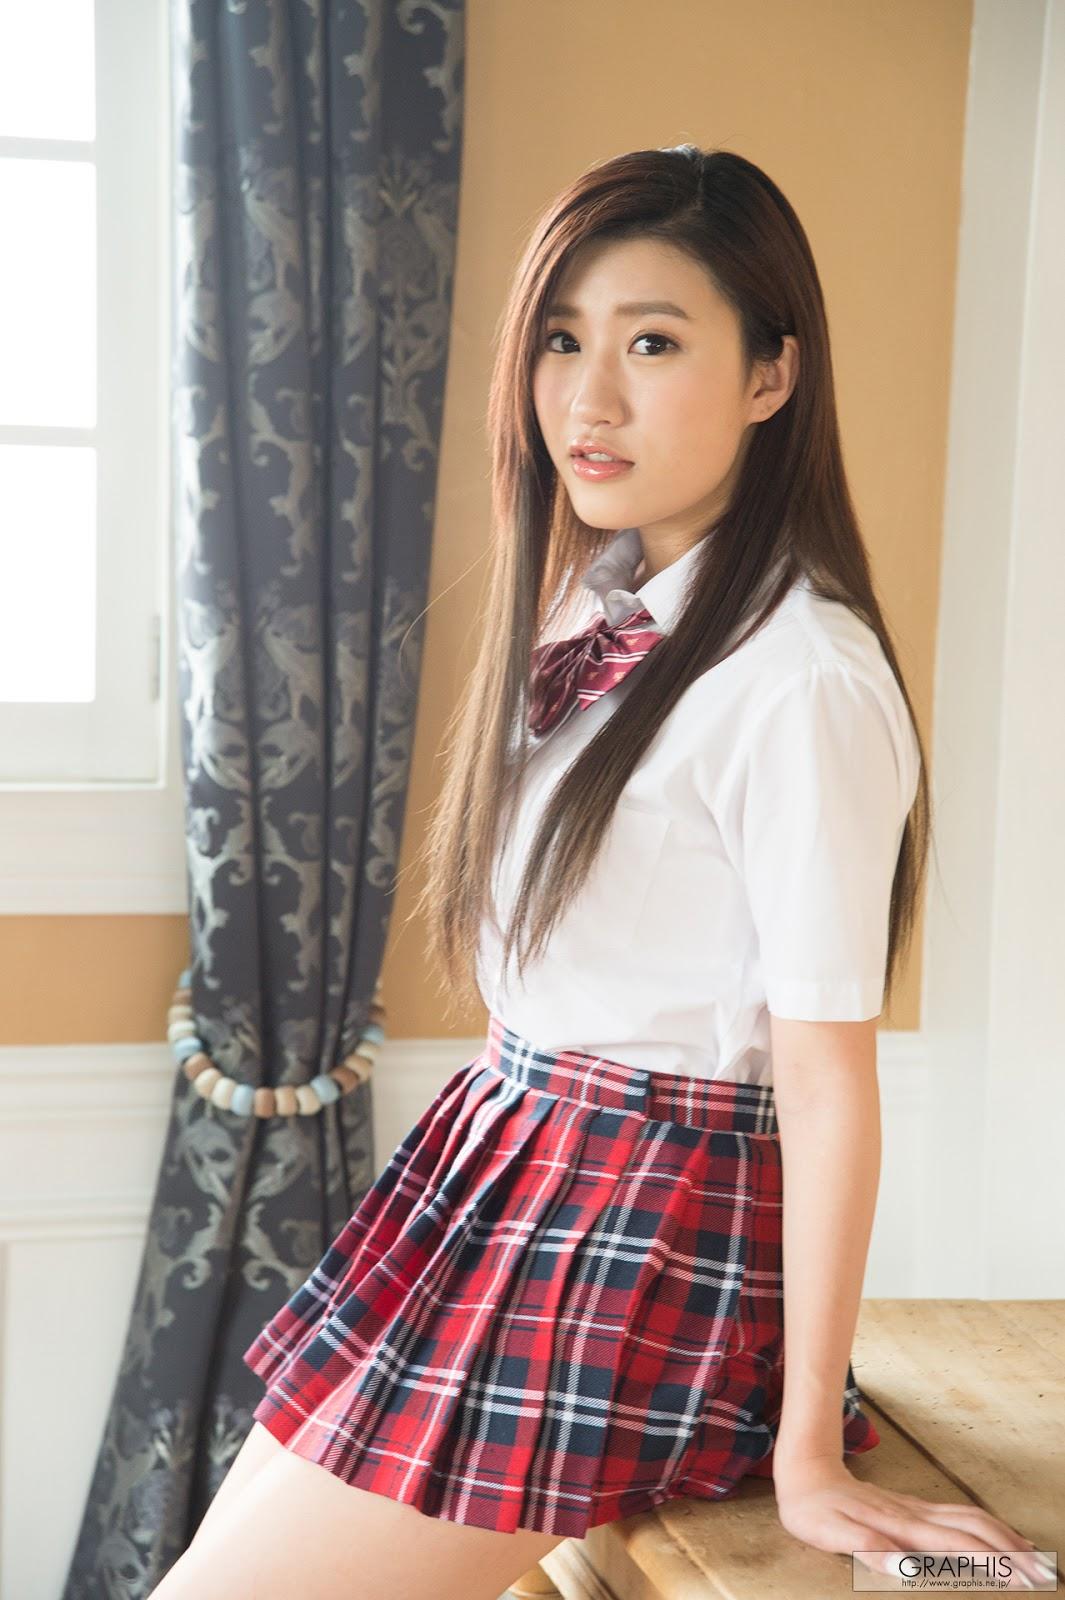 JAV Idols & Pornstars List, Top Japanese AV Models - JAVDOCK